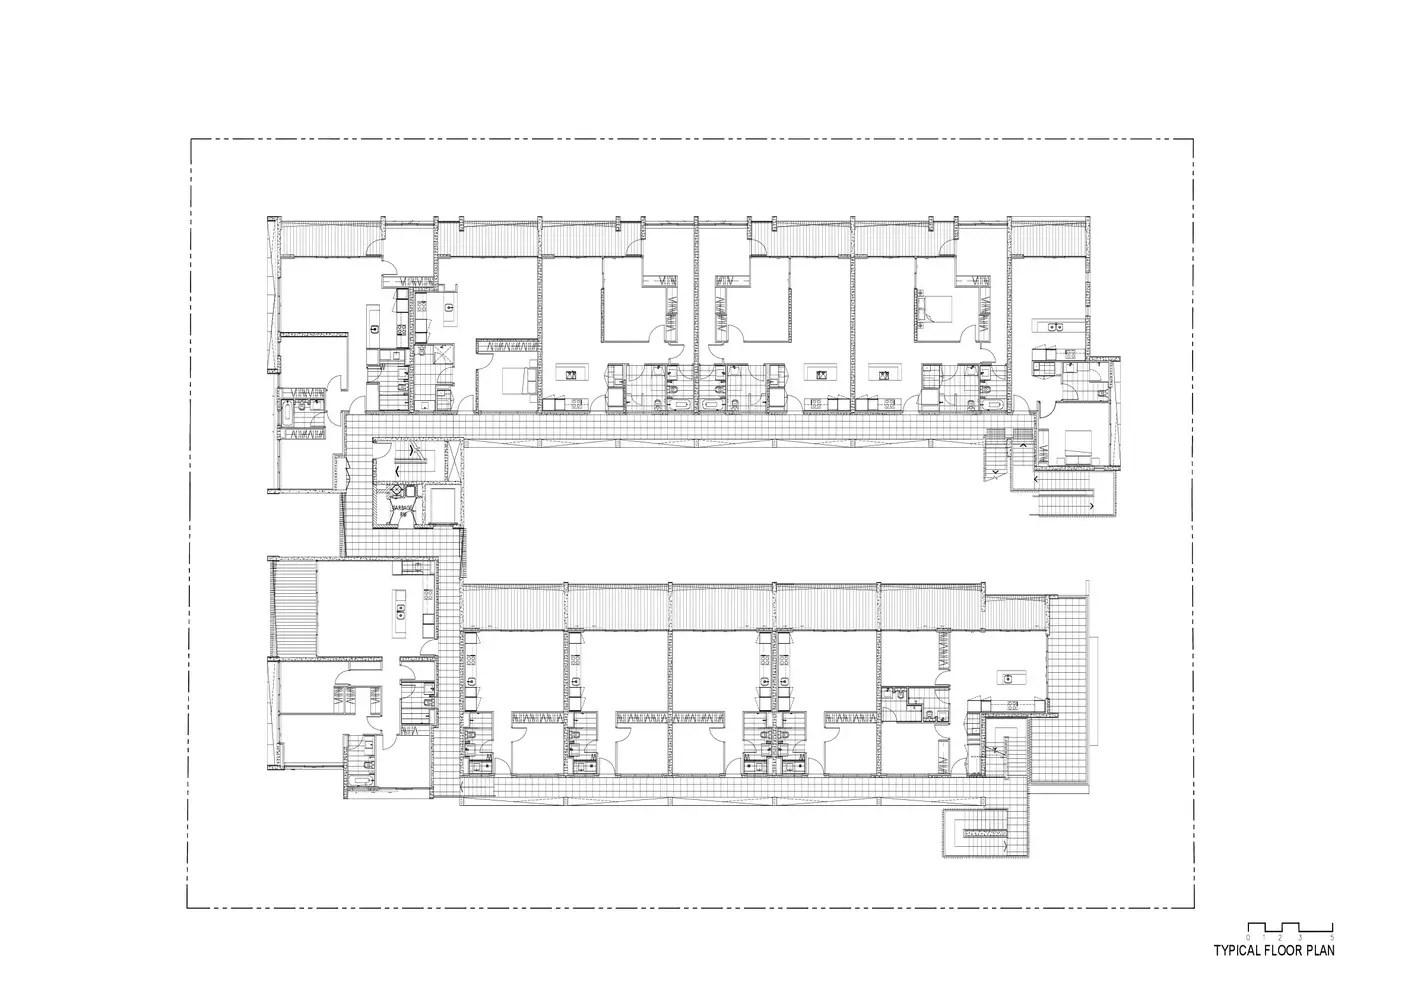 Markrting_level_1_plan-a3-001